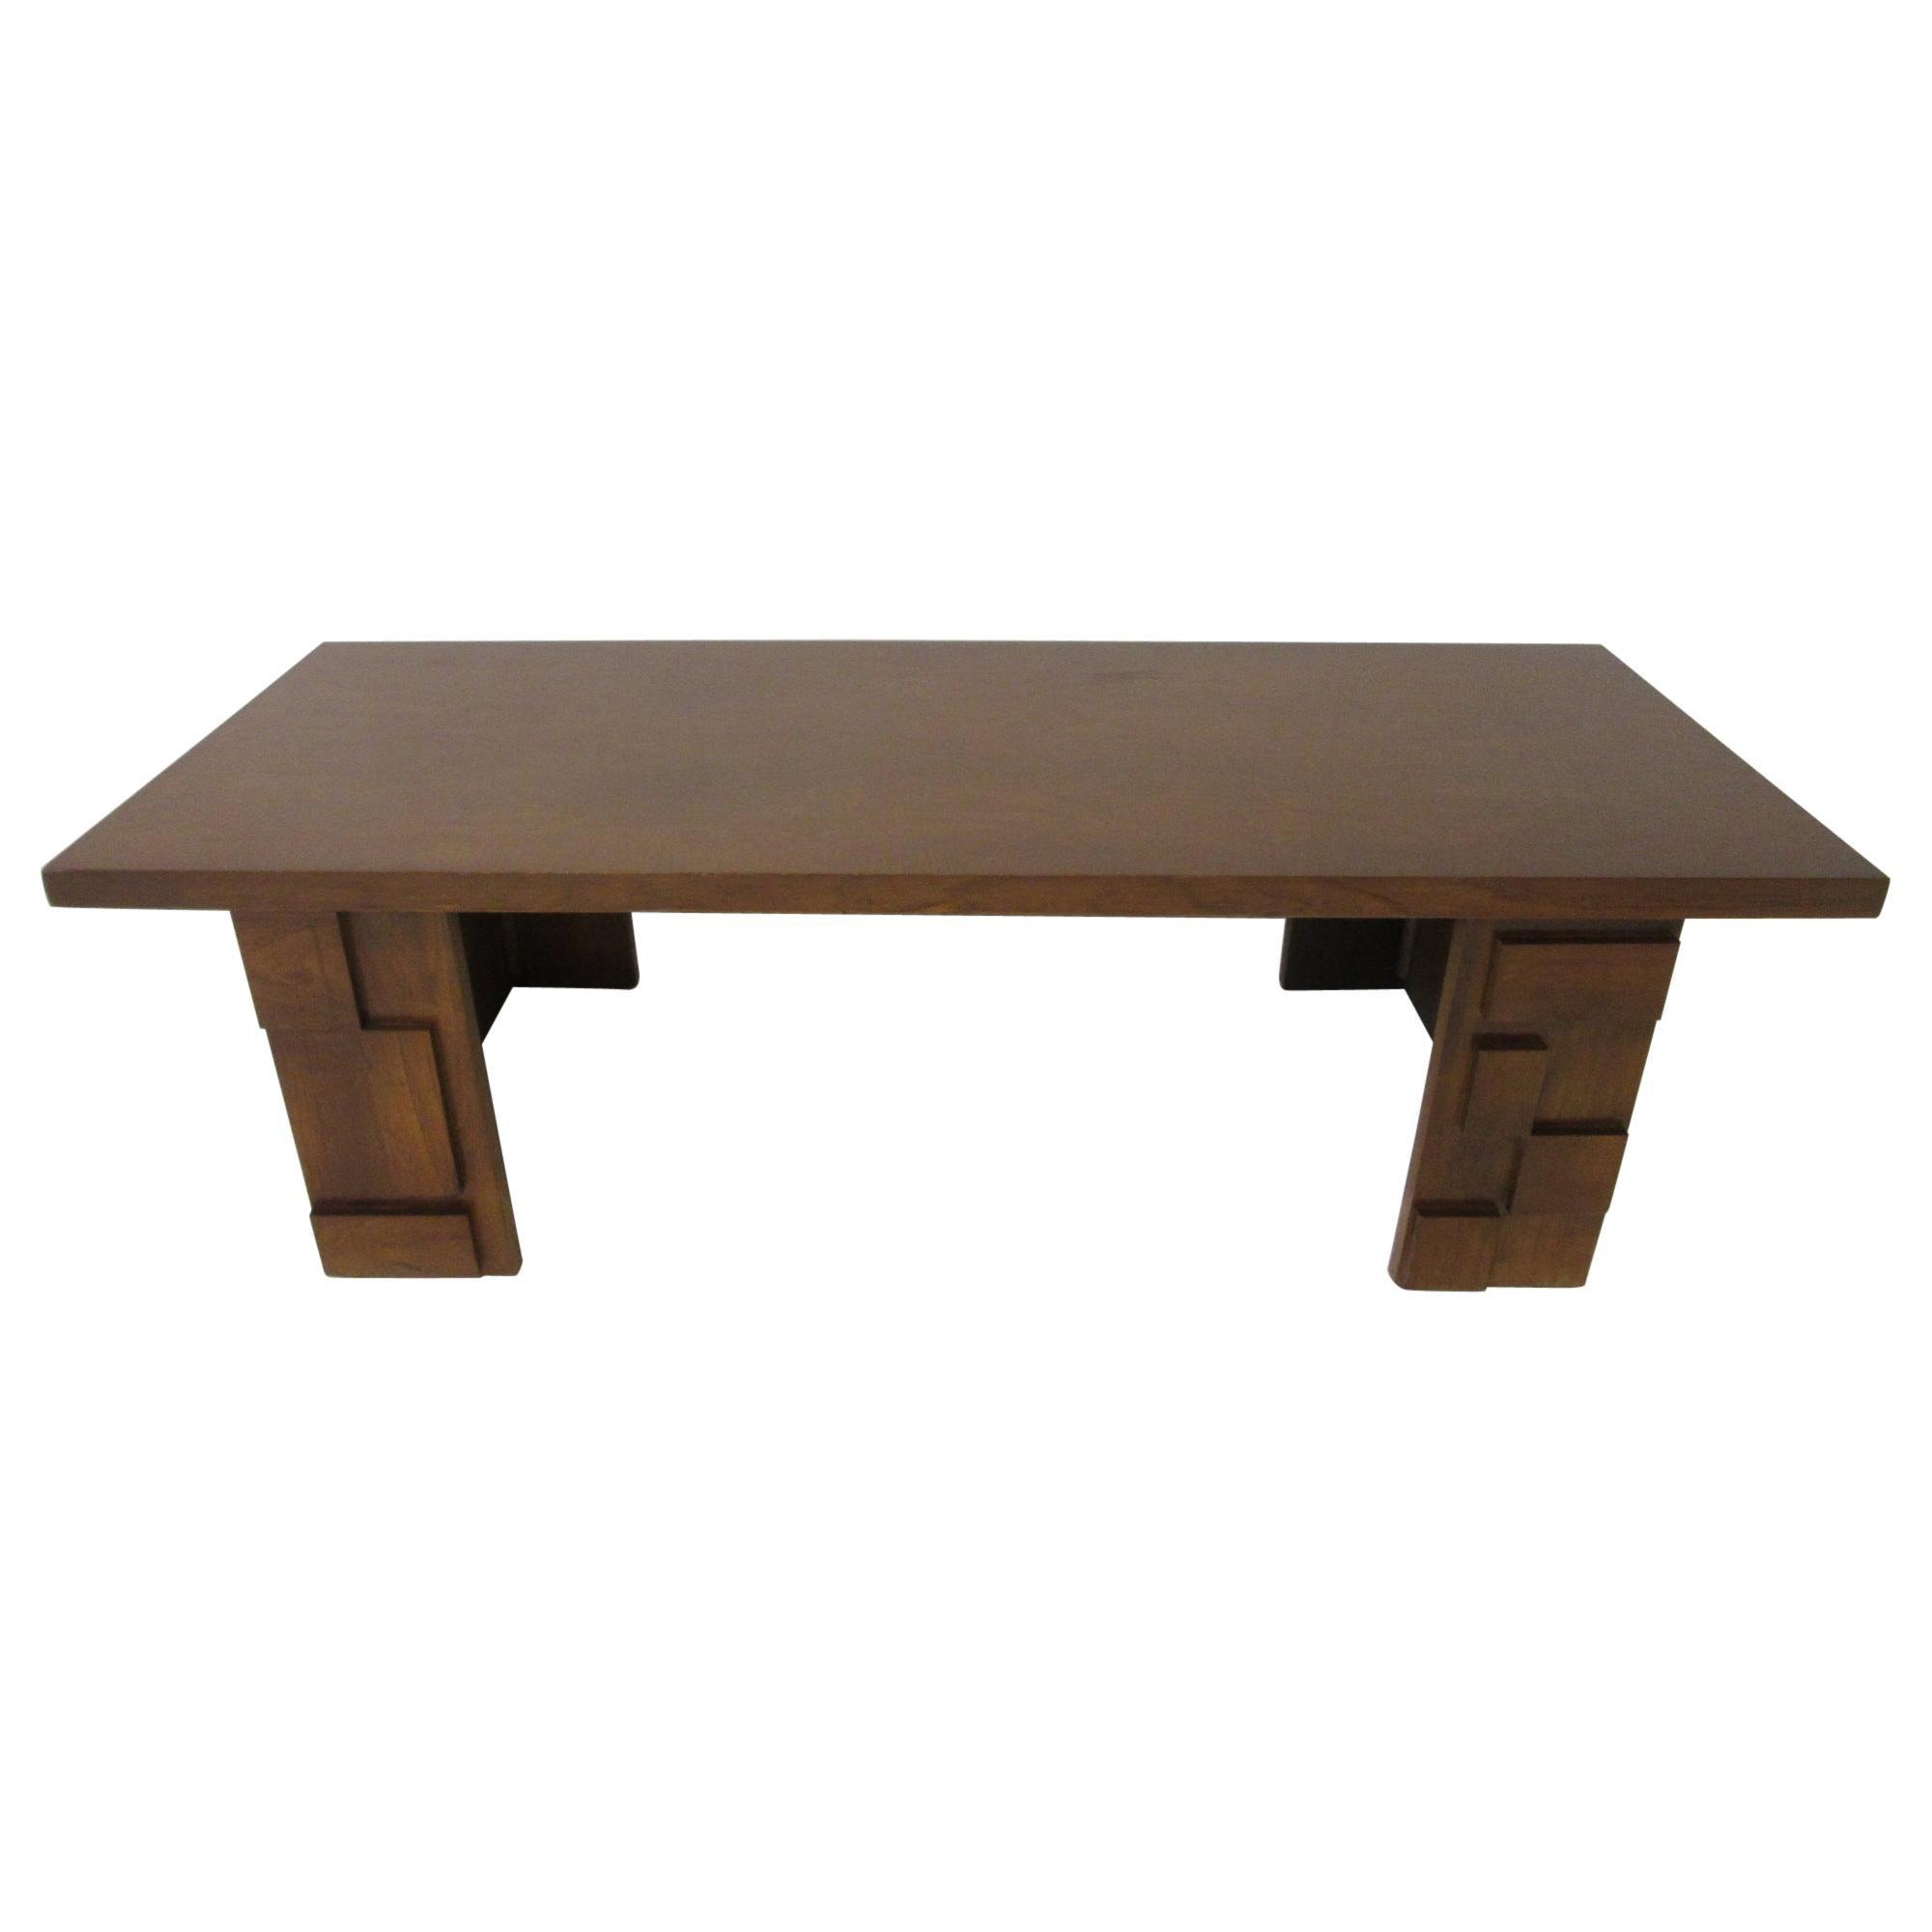 Brutalist Wood Coffee Table by Lane Altavista